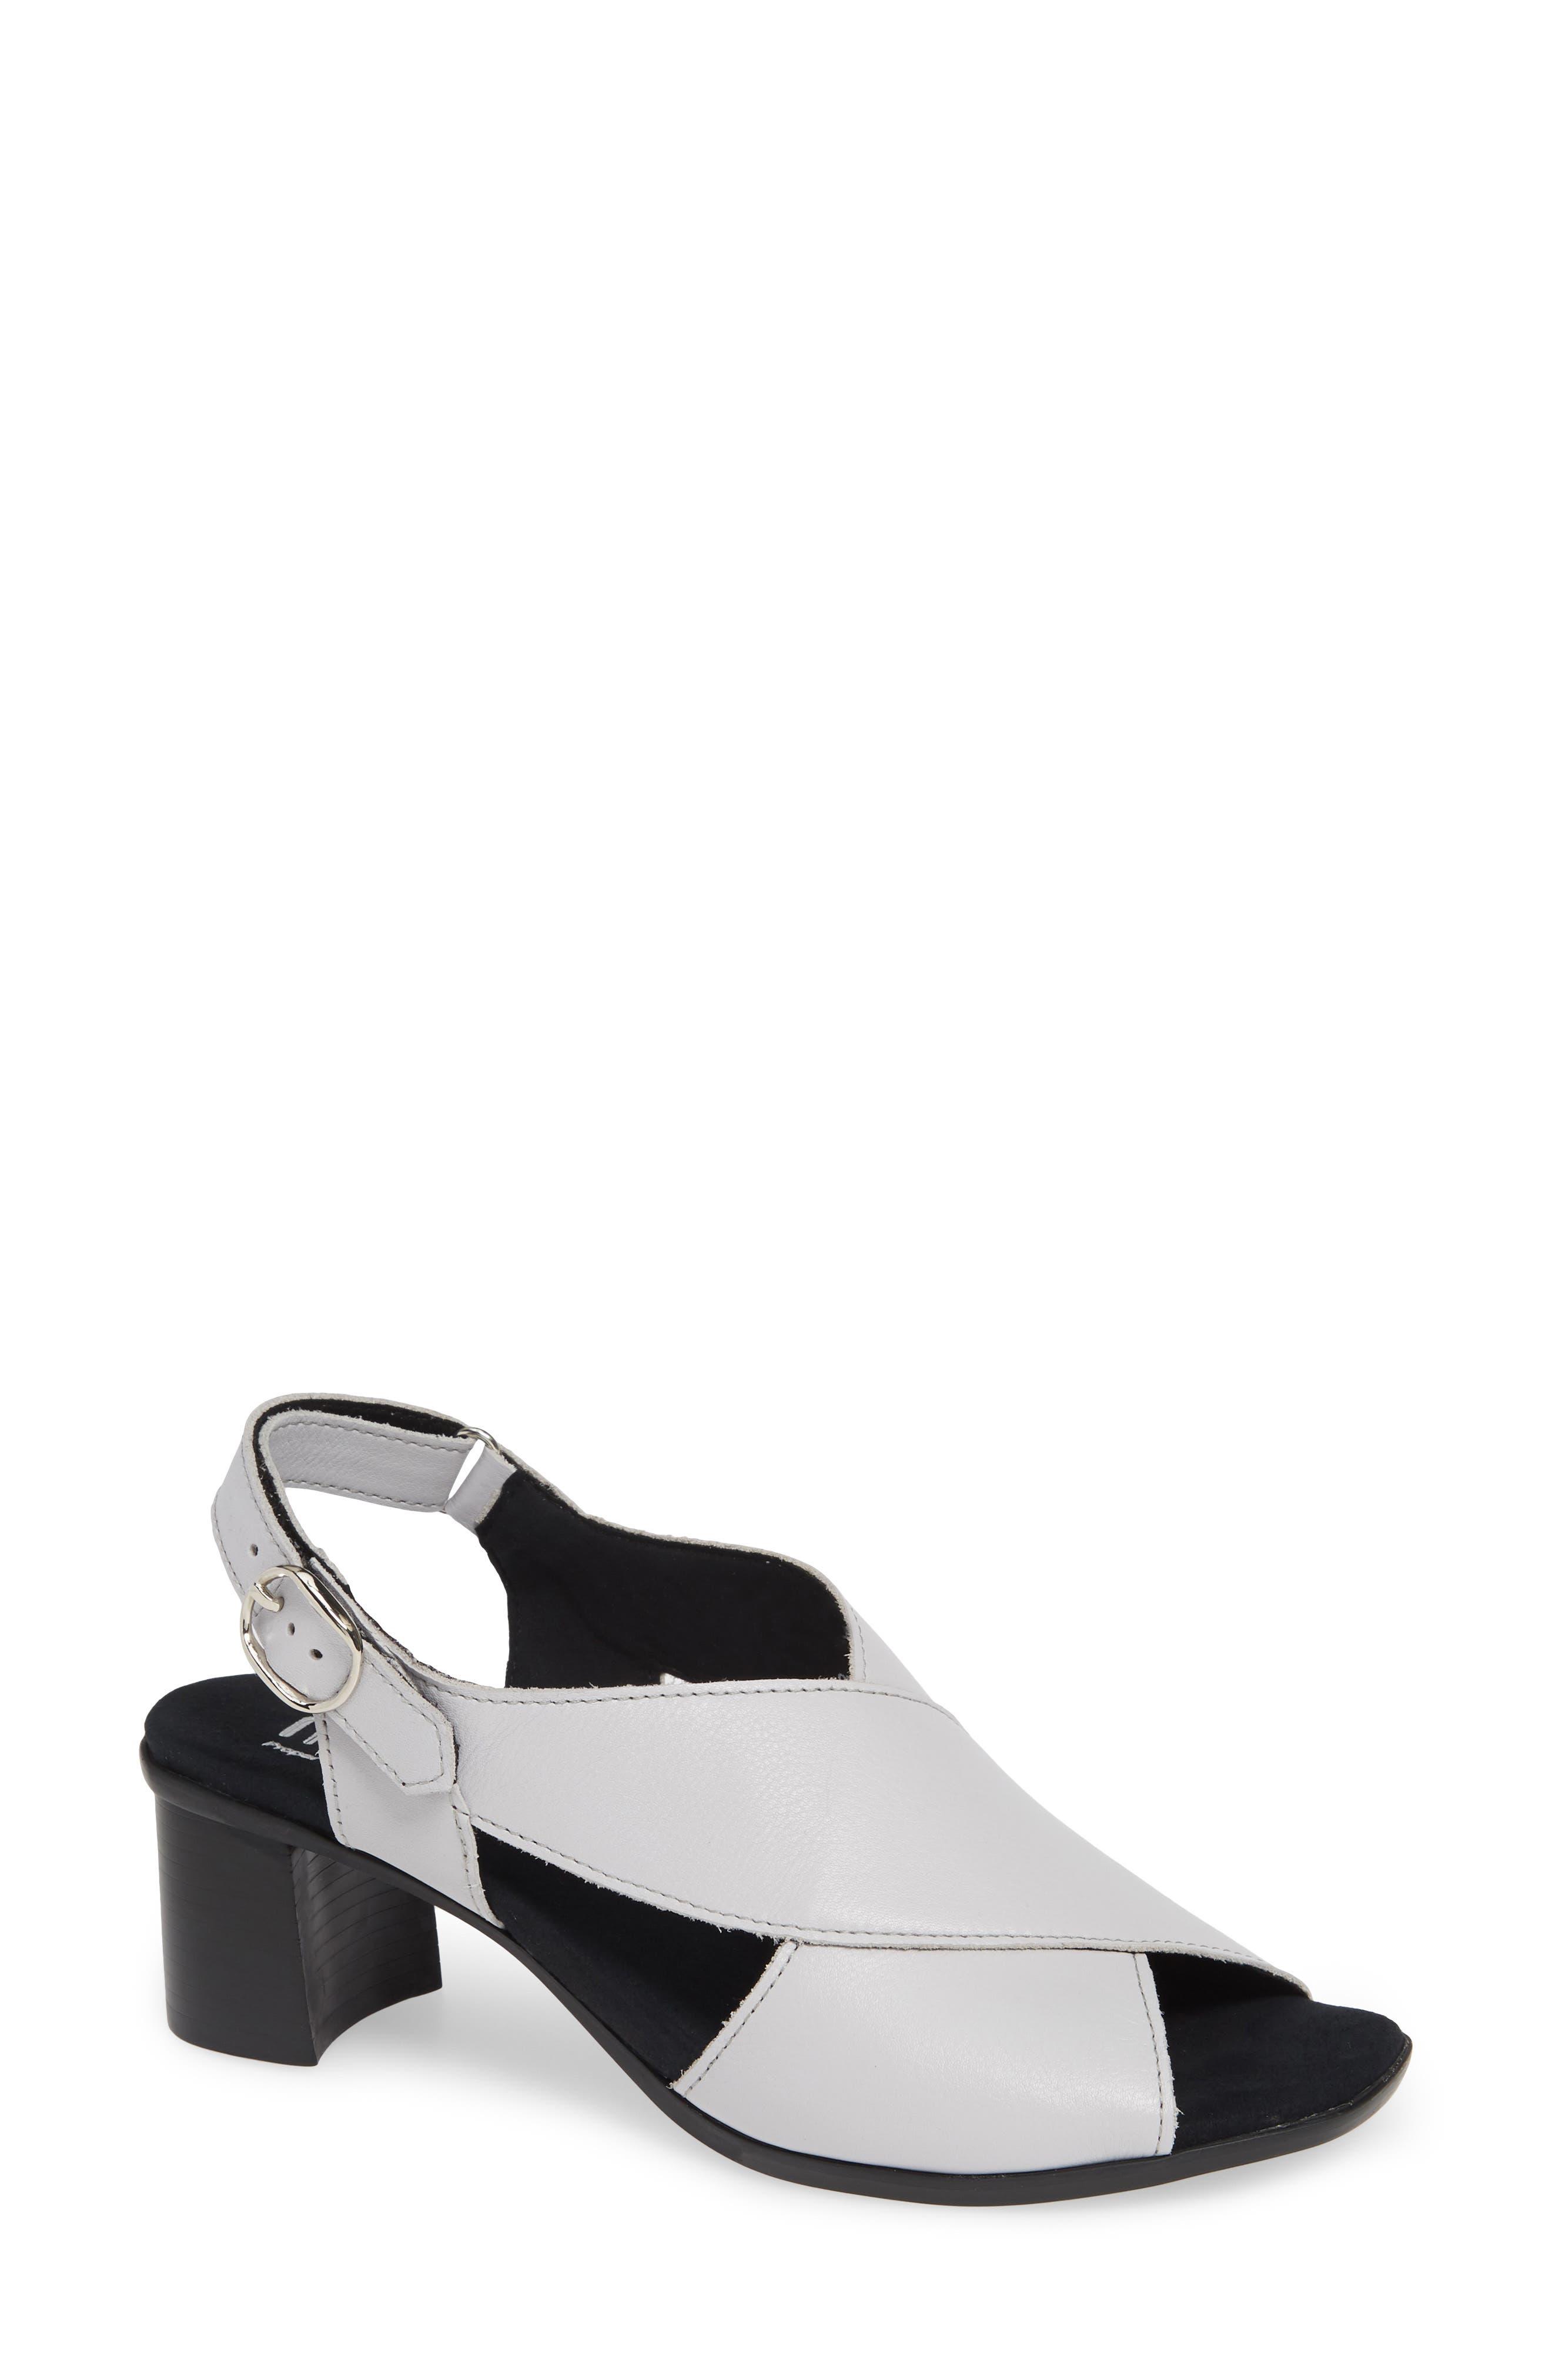 Laine Block Heel Sandal,                         Main,                         color, WHITE LEATHER